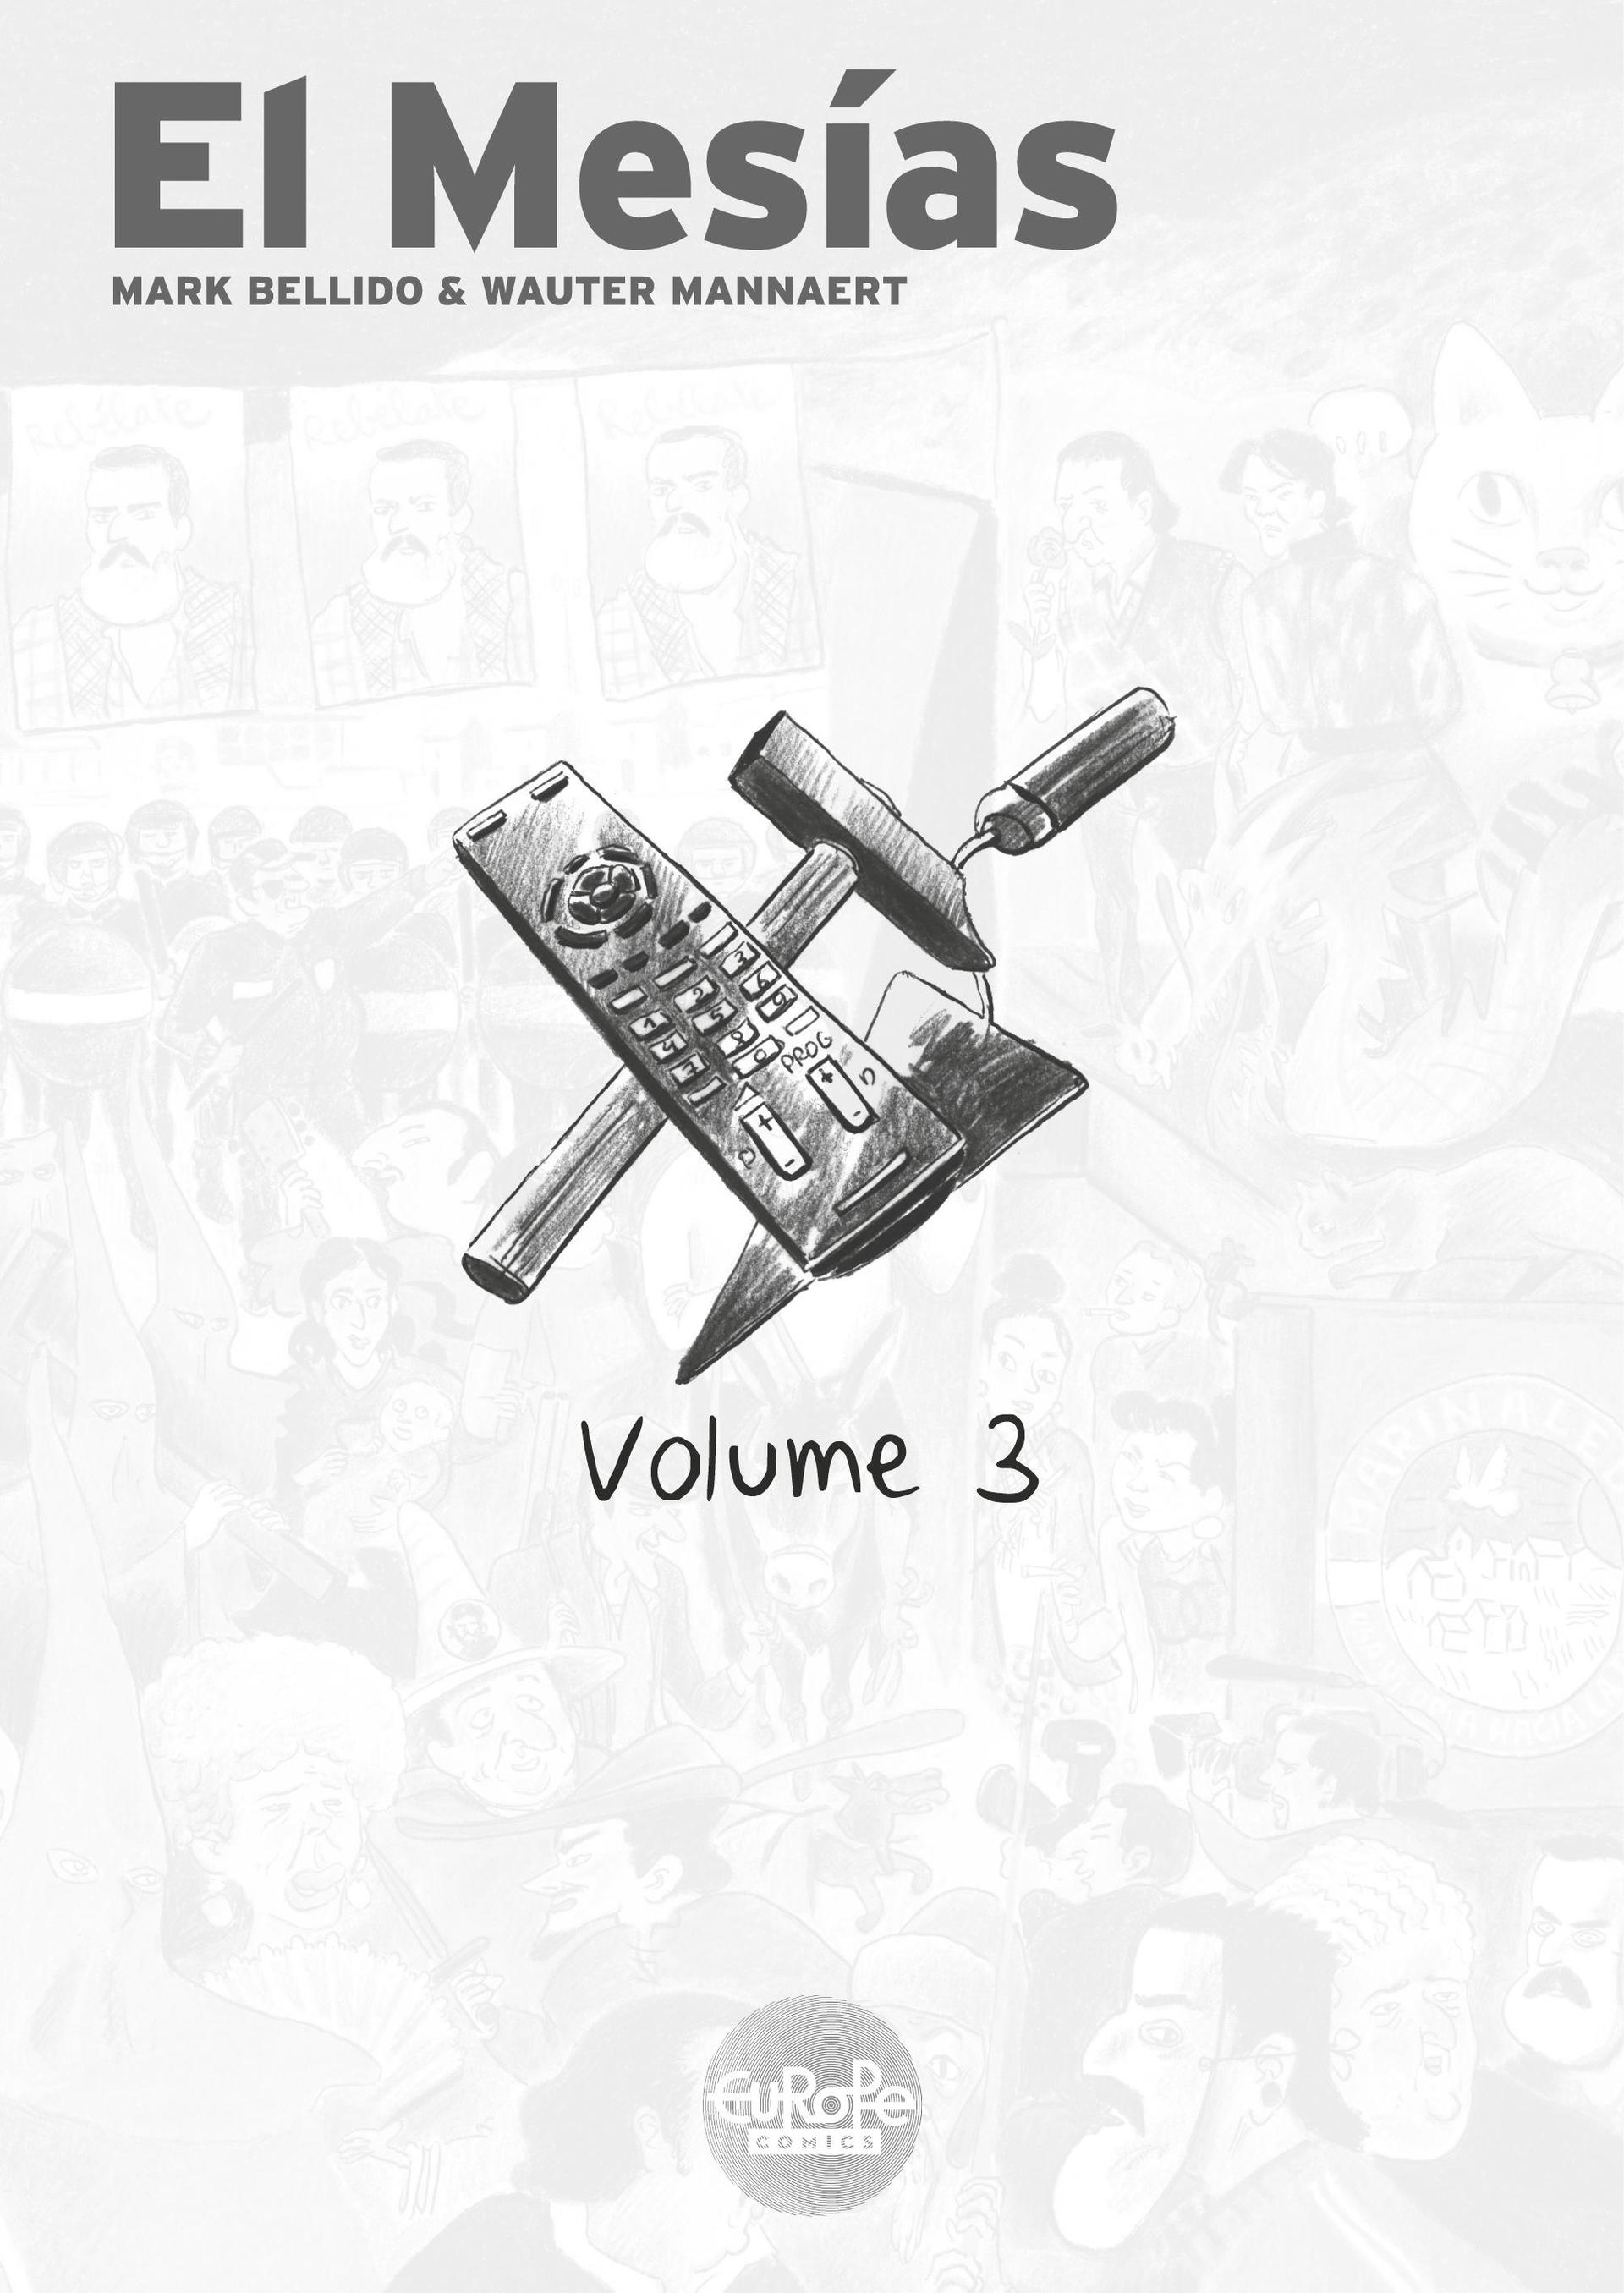 El Mesias - Volume 3